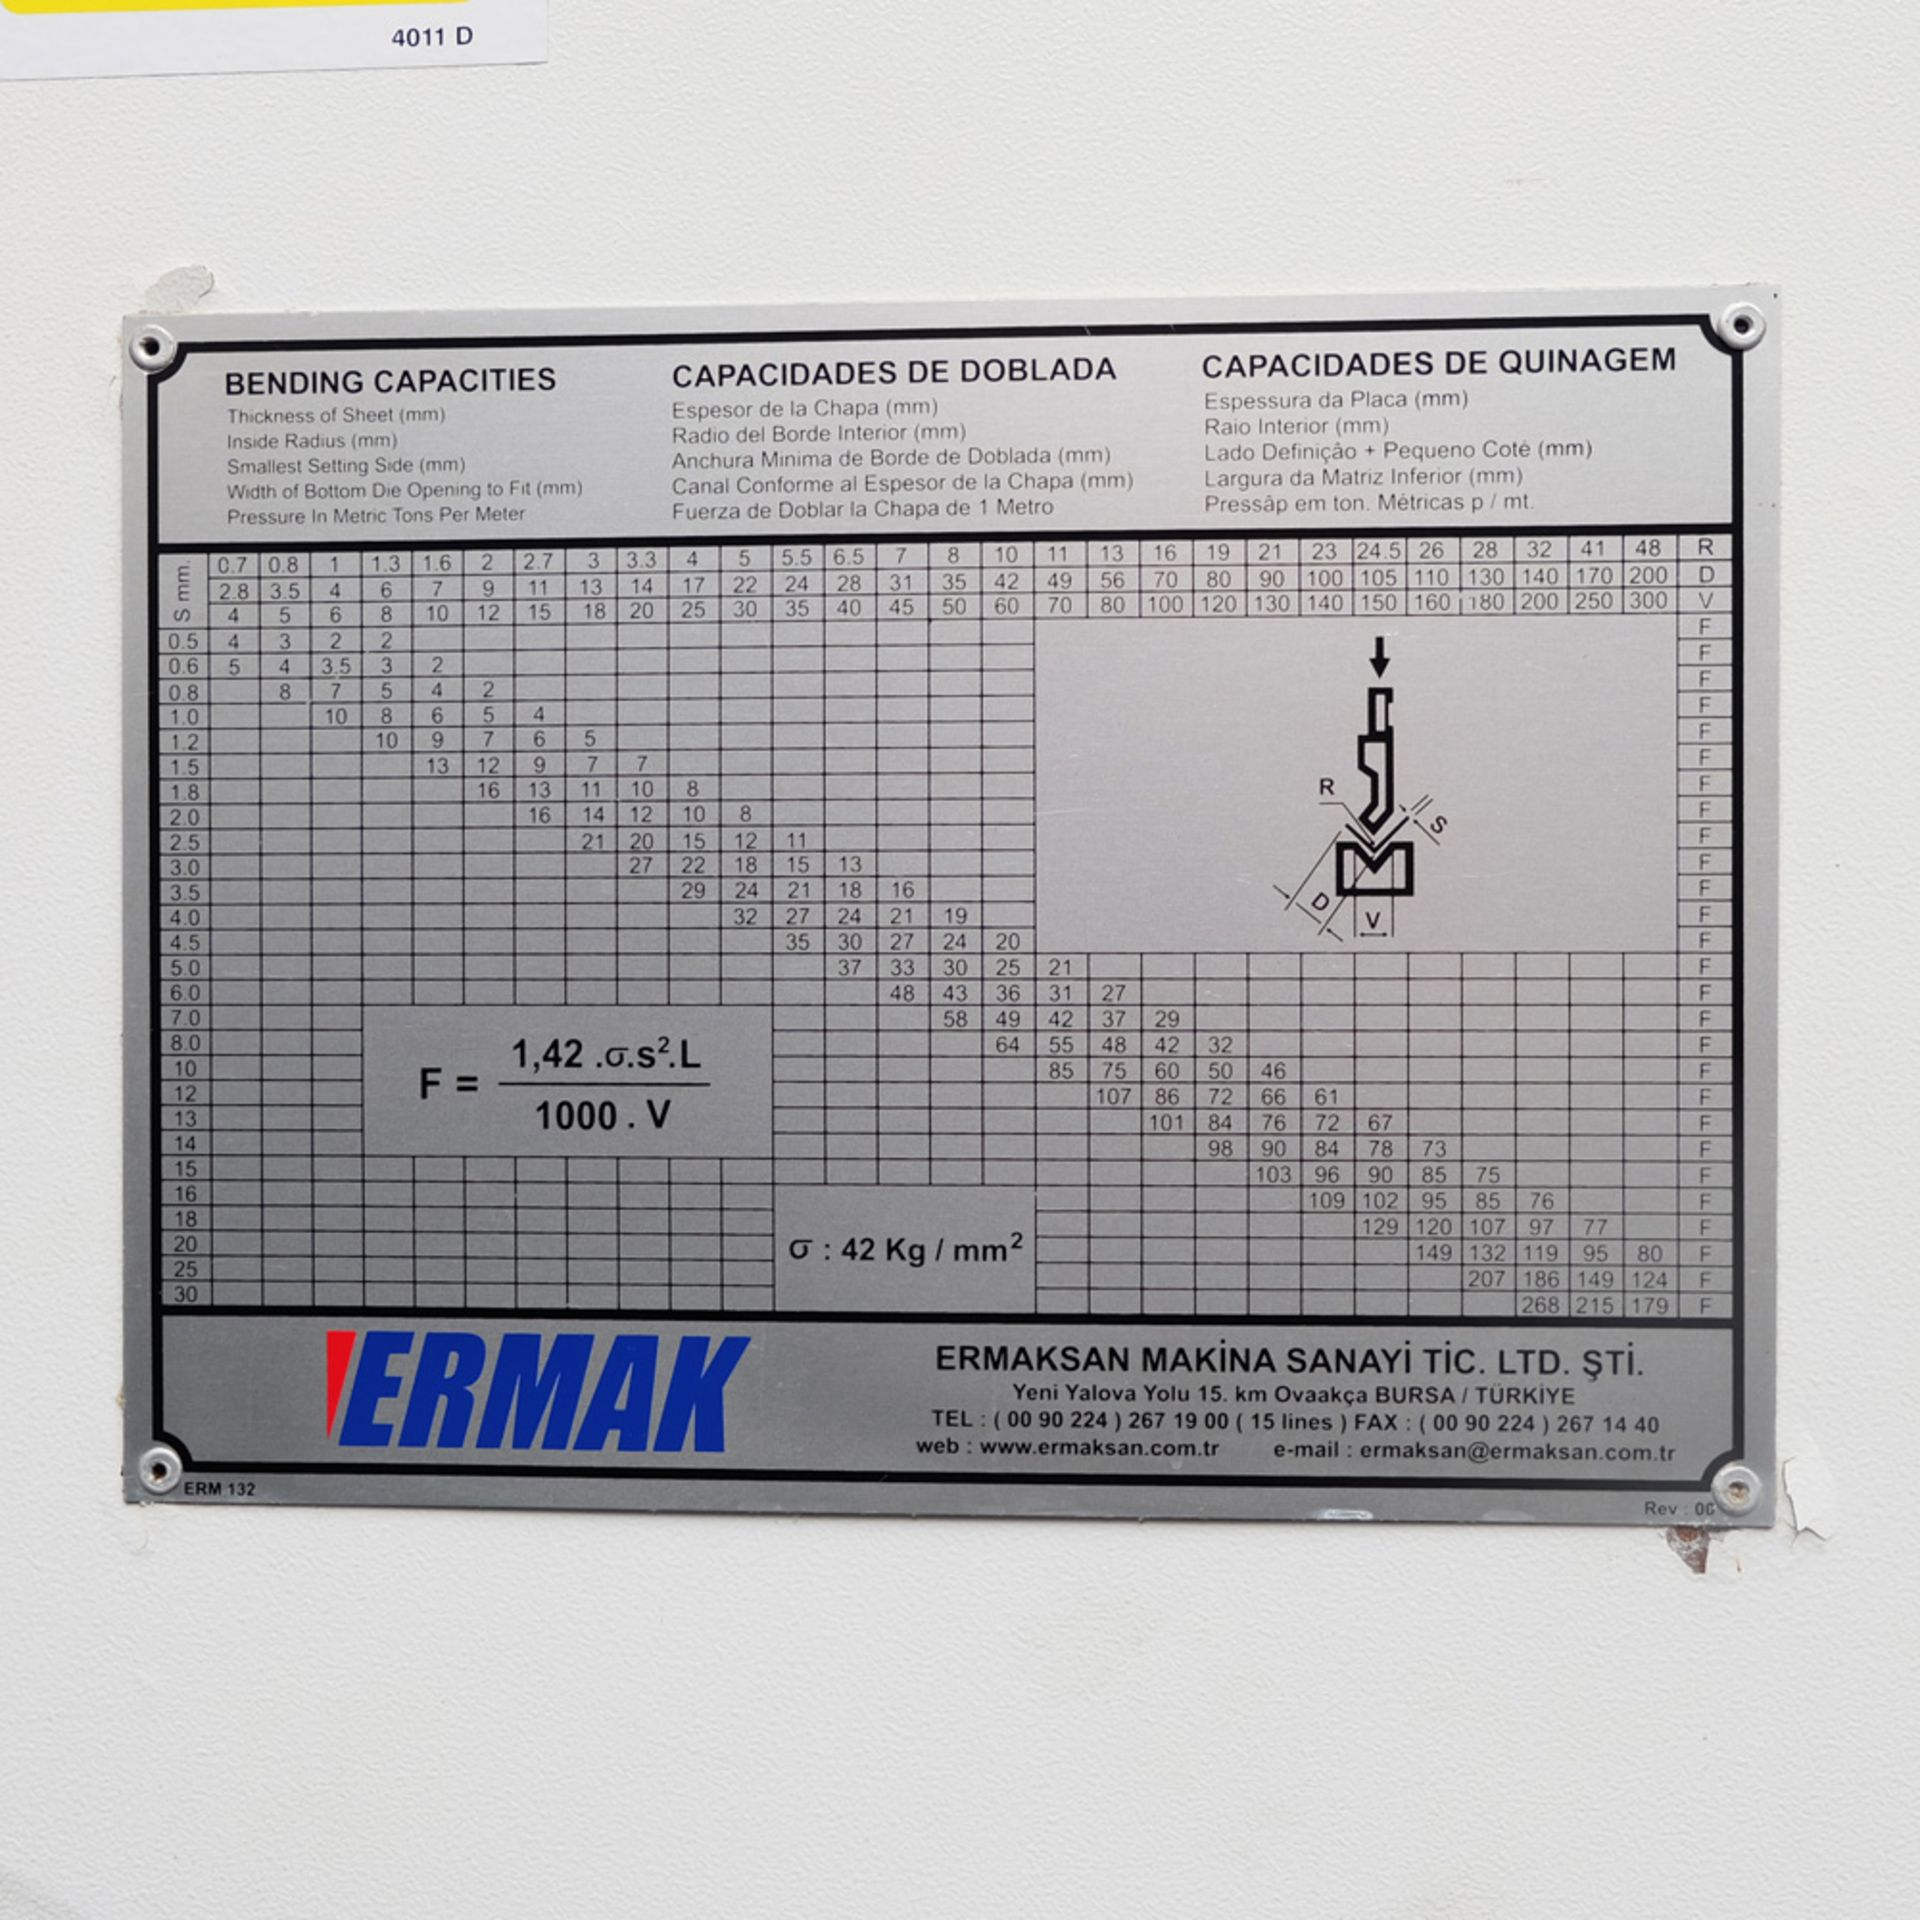 Ermak AP3120 Hydraulic Downstroke Press Brake. Capacity 3100mm x 6mm. Bending Force 120 Ton. - Image 9 of 14